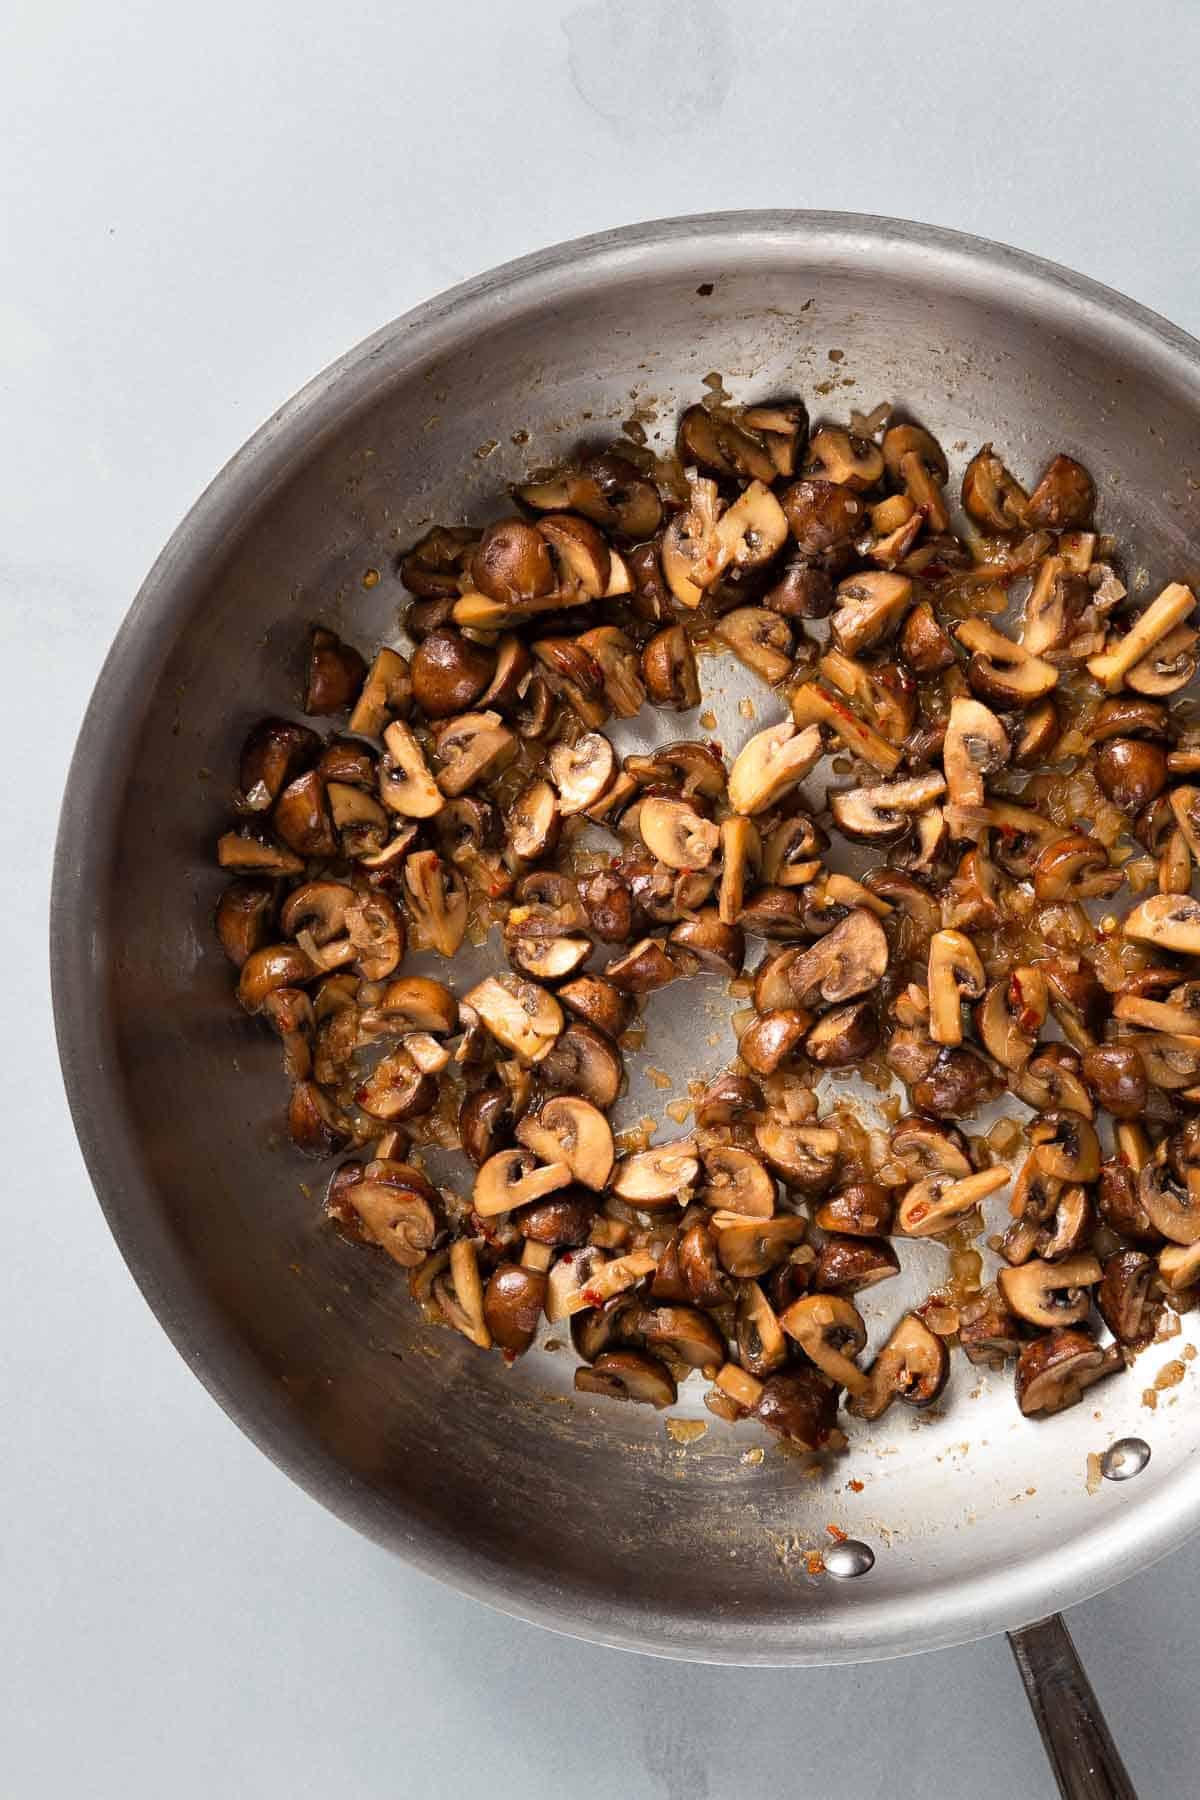 Cooking mushrooms in a large metal pan